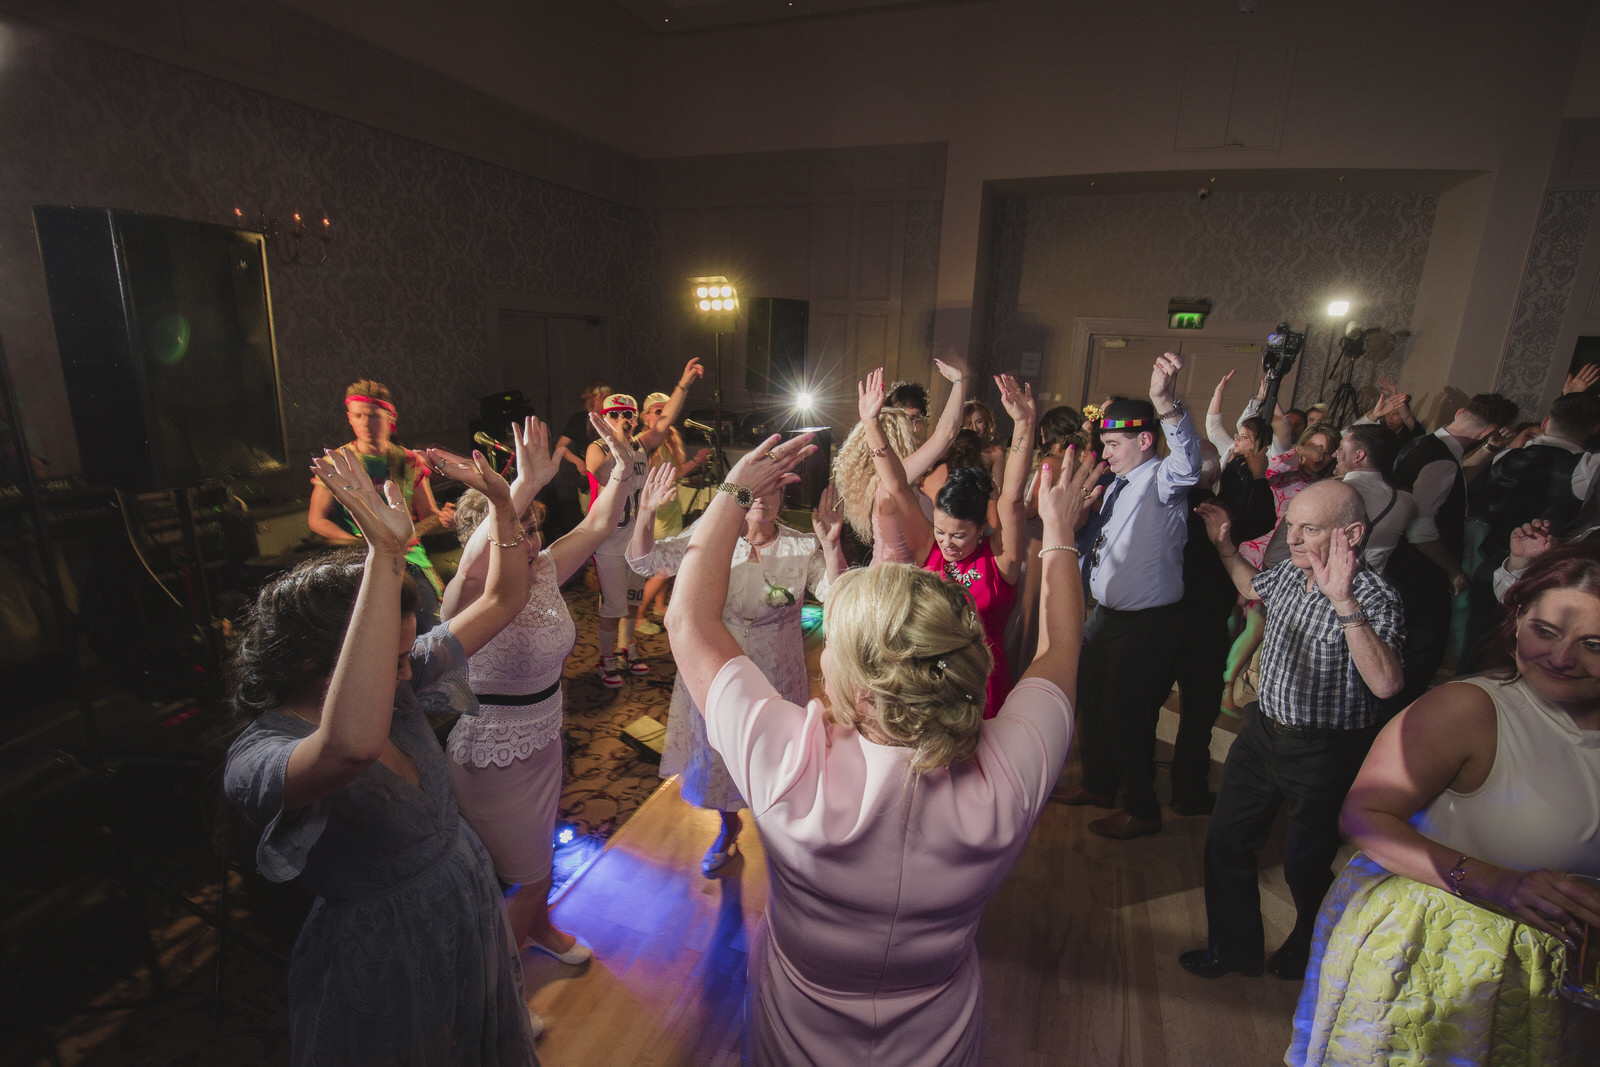 waterford_faithlegg_wedding_photographer_goldenmonentsweddingphotography_a558.jpg